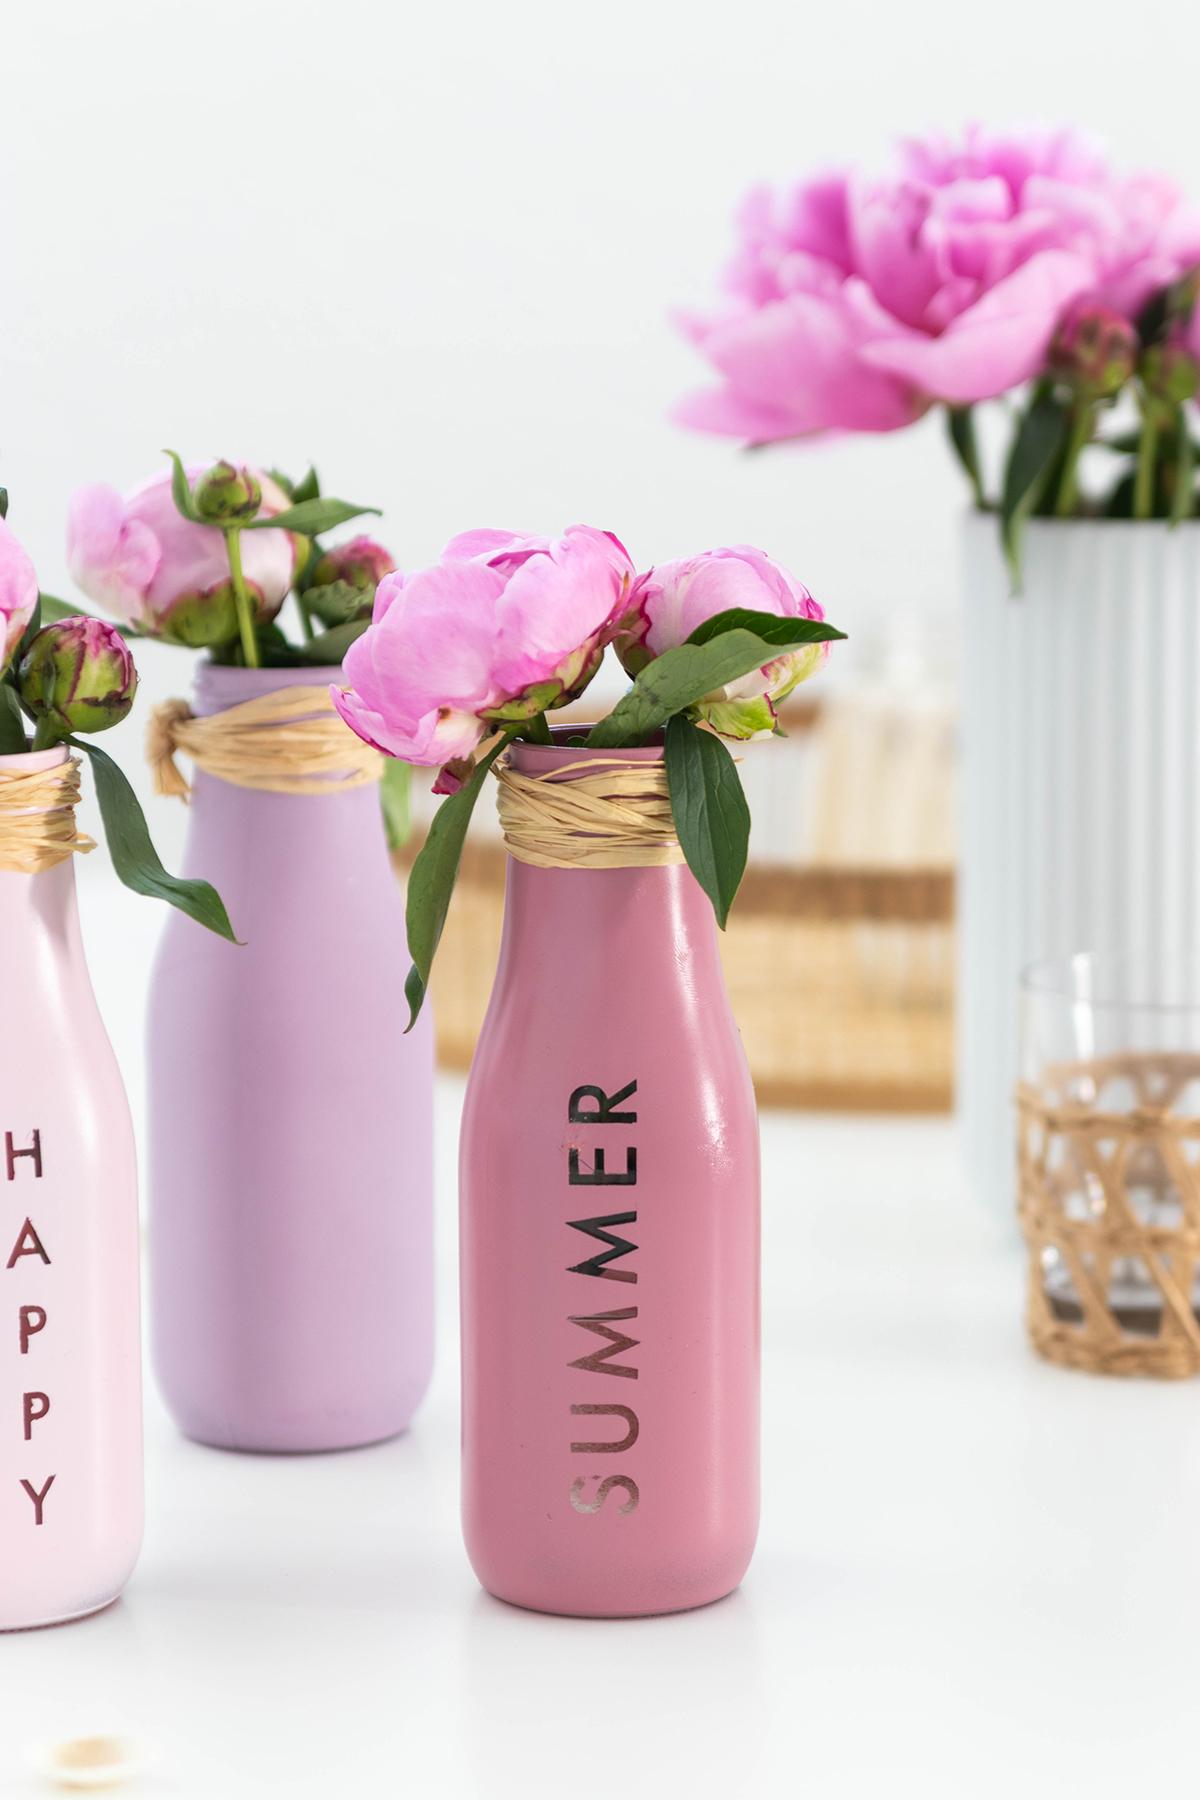 DIY Vasen mit Typo basteln